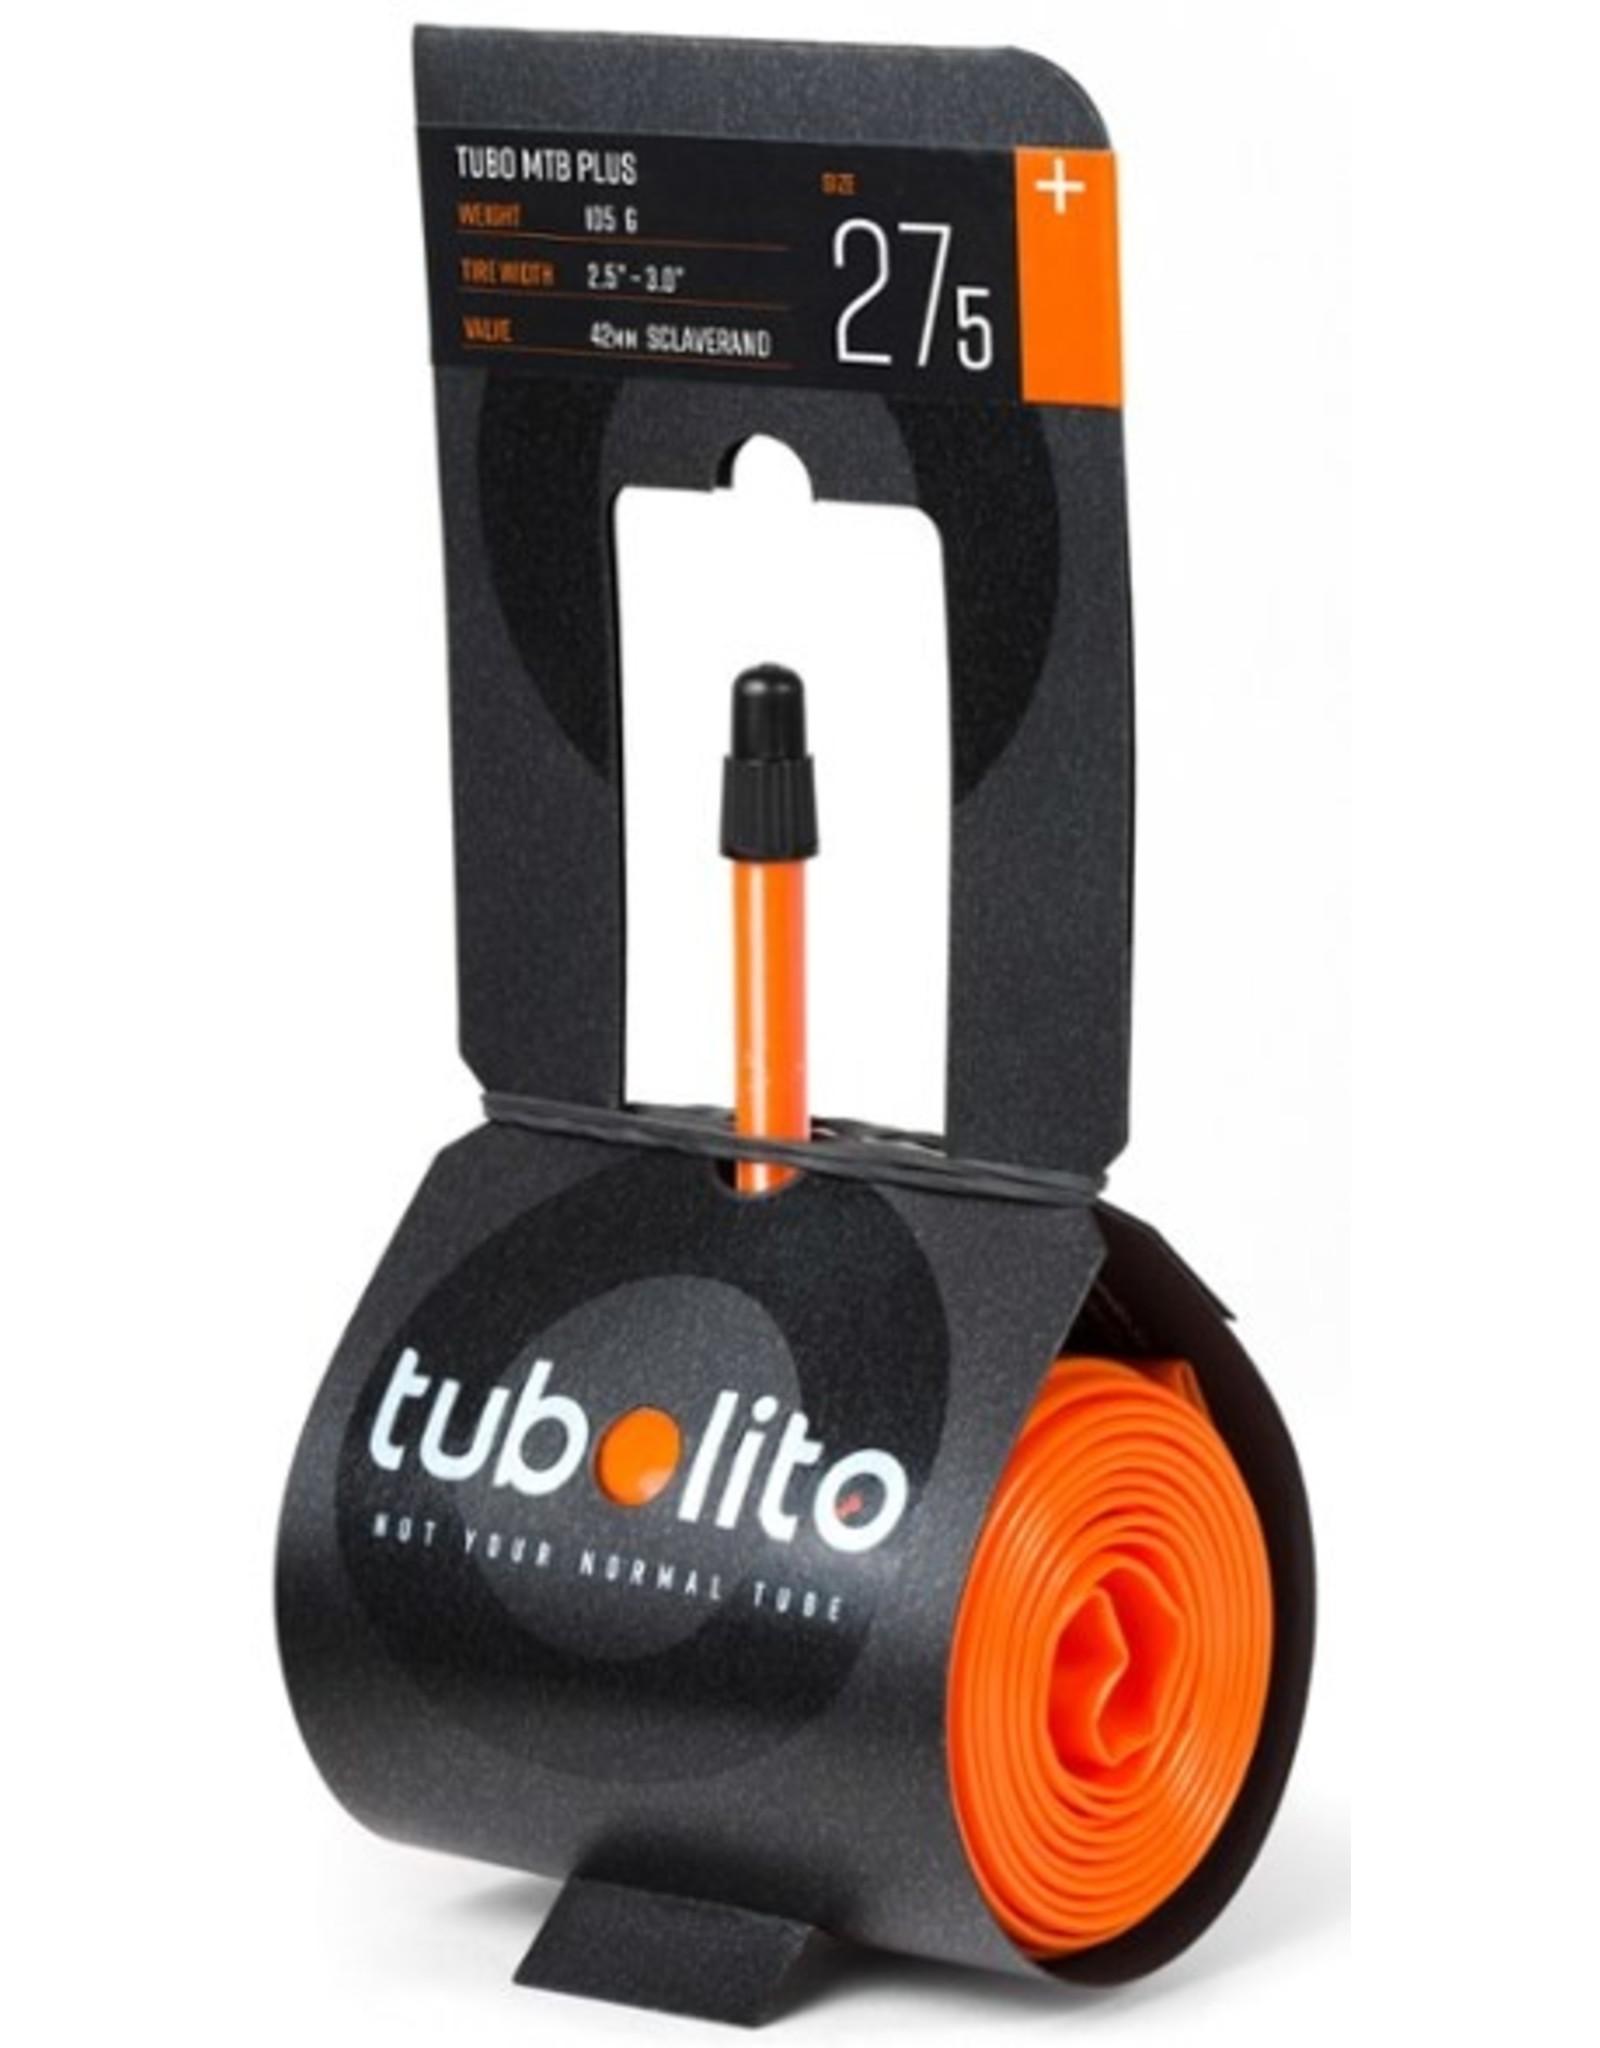 "Tubolito Tubolito Tube 27.5 Plus (2.5-3"")"